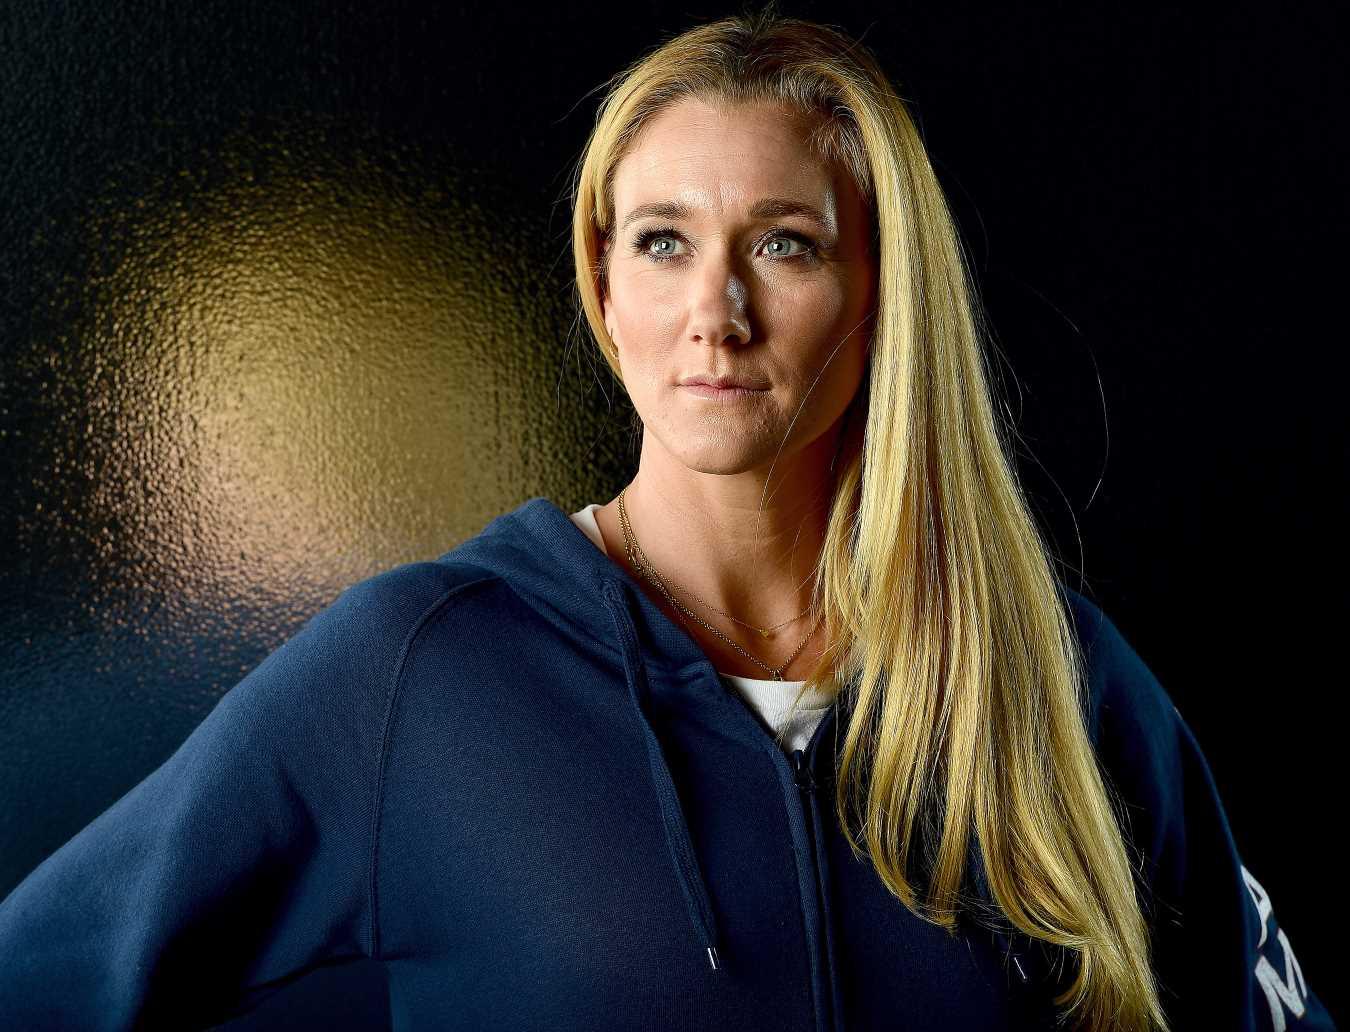 Kerri Walsh Jennings Is 'Laser-Focused' on 2020 Olympics After Feeling 'Dissatisfied' in Rio